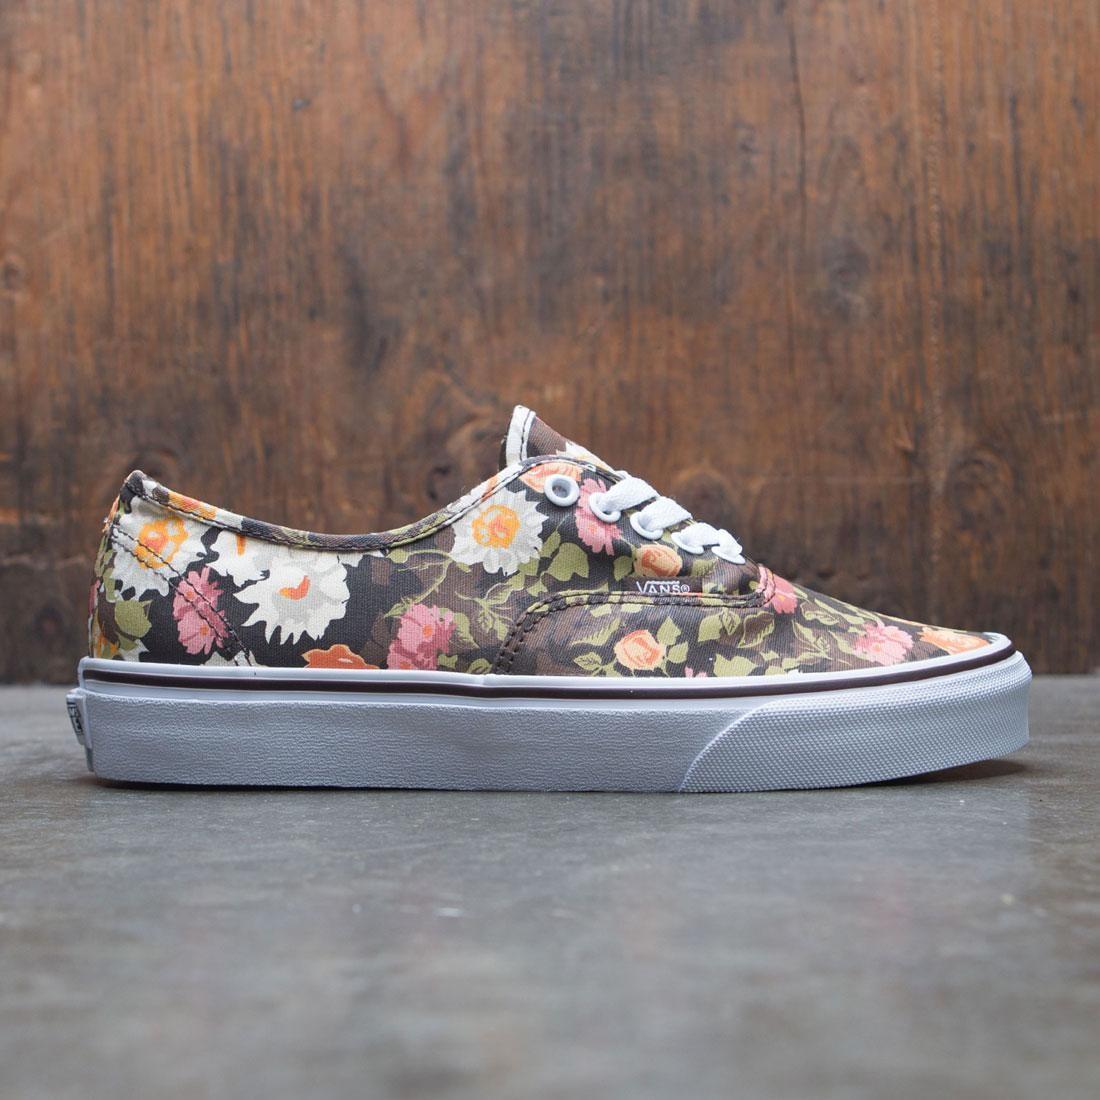 Vans Men Authentic - Abstract Floral